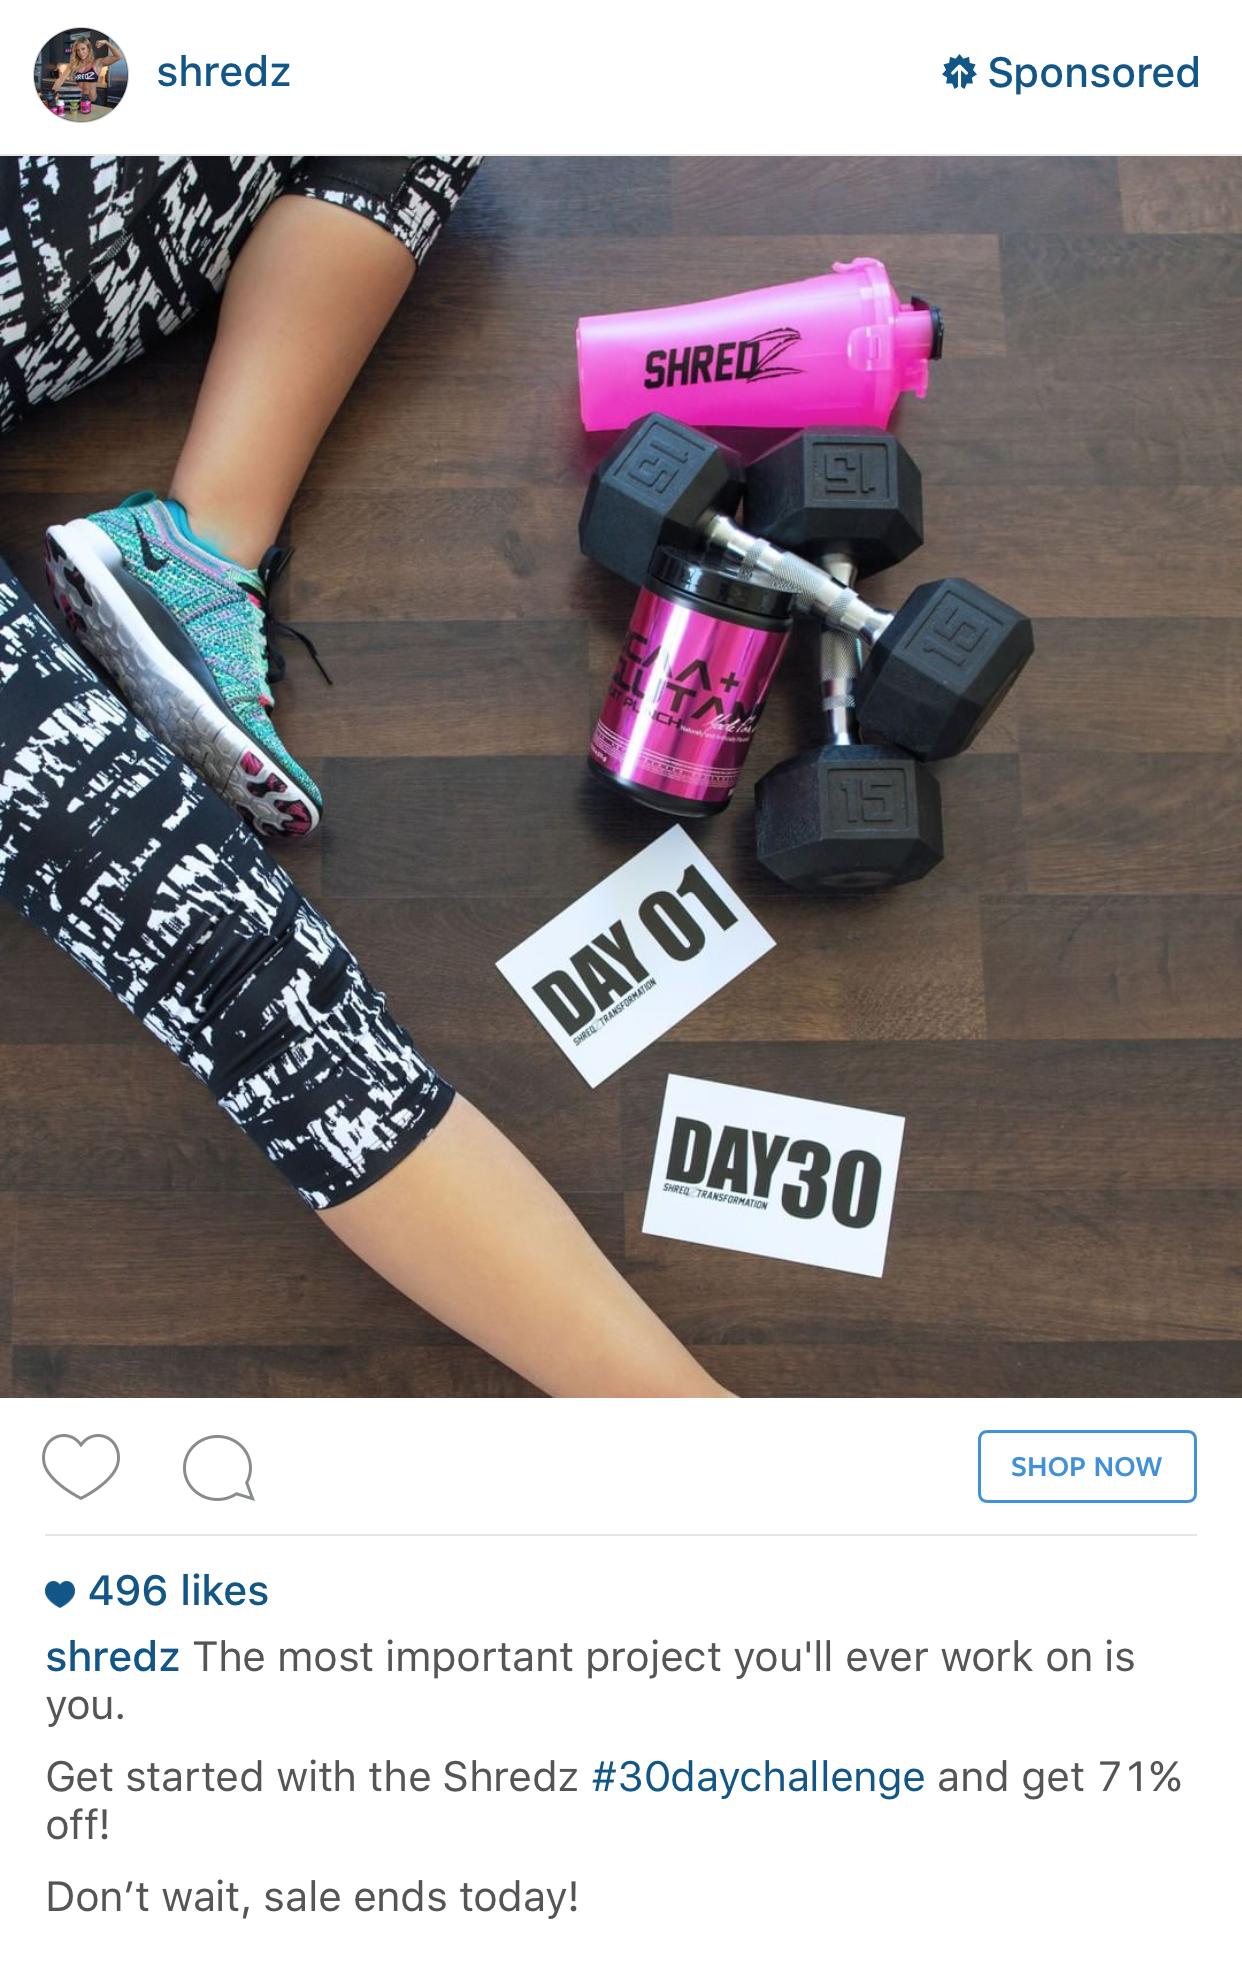 Shredz fitness app install instagram ad example instagram ad shredz fitness app install instagram ad example fandeluxe Images